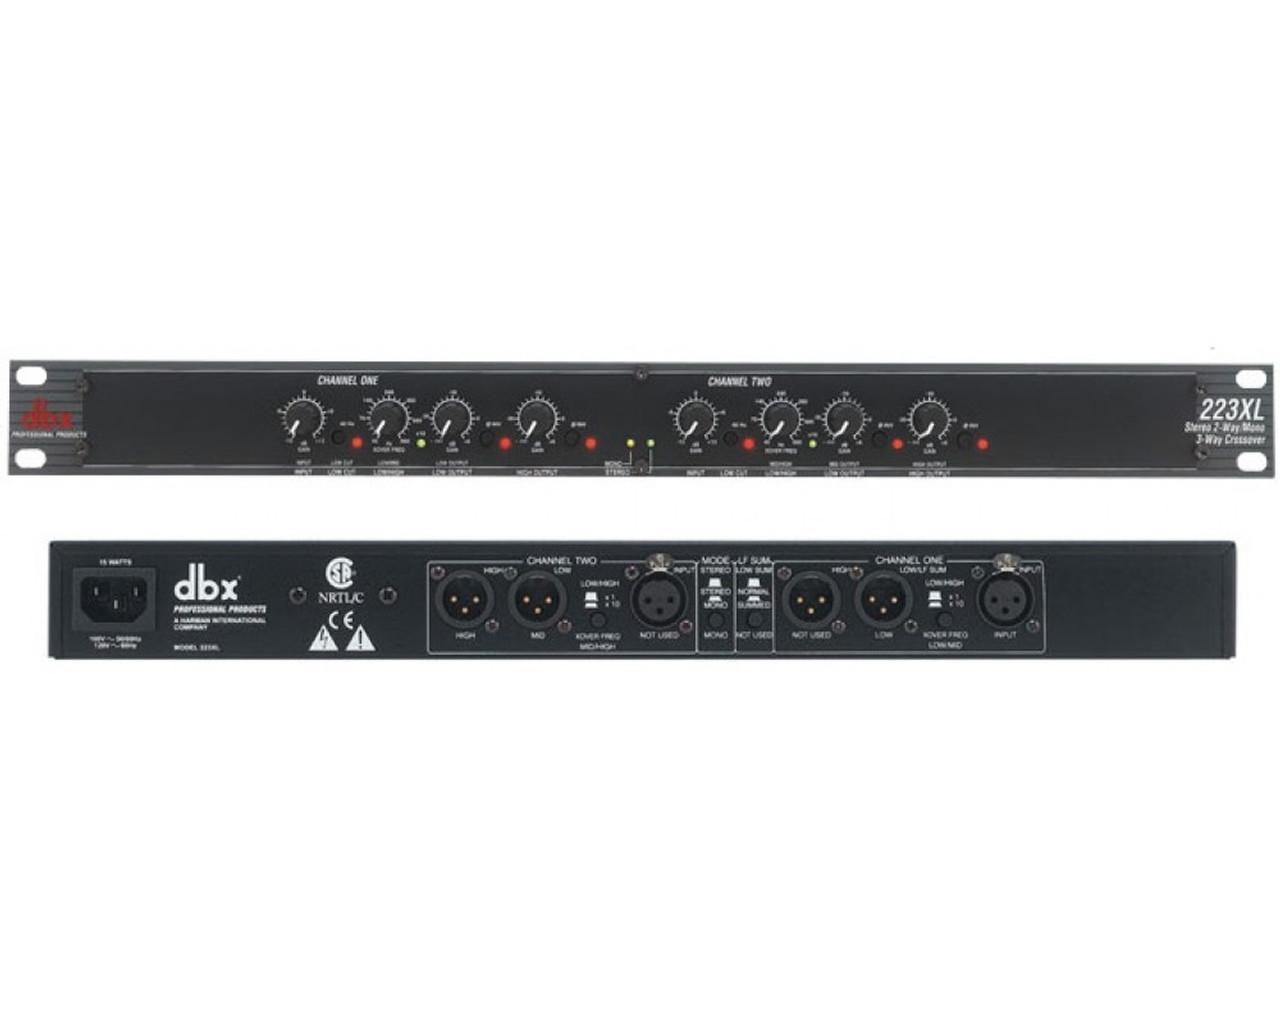 dbx 223xl Hook up Philips Surround Sound Hook up